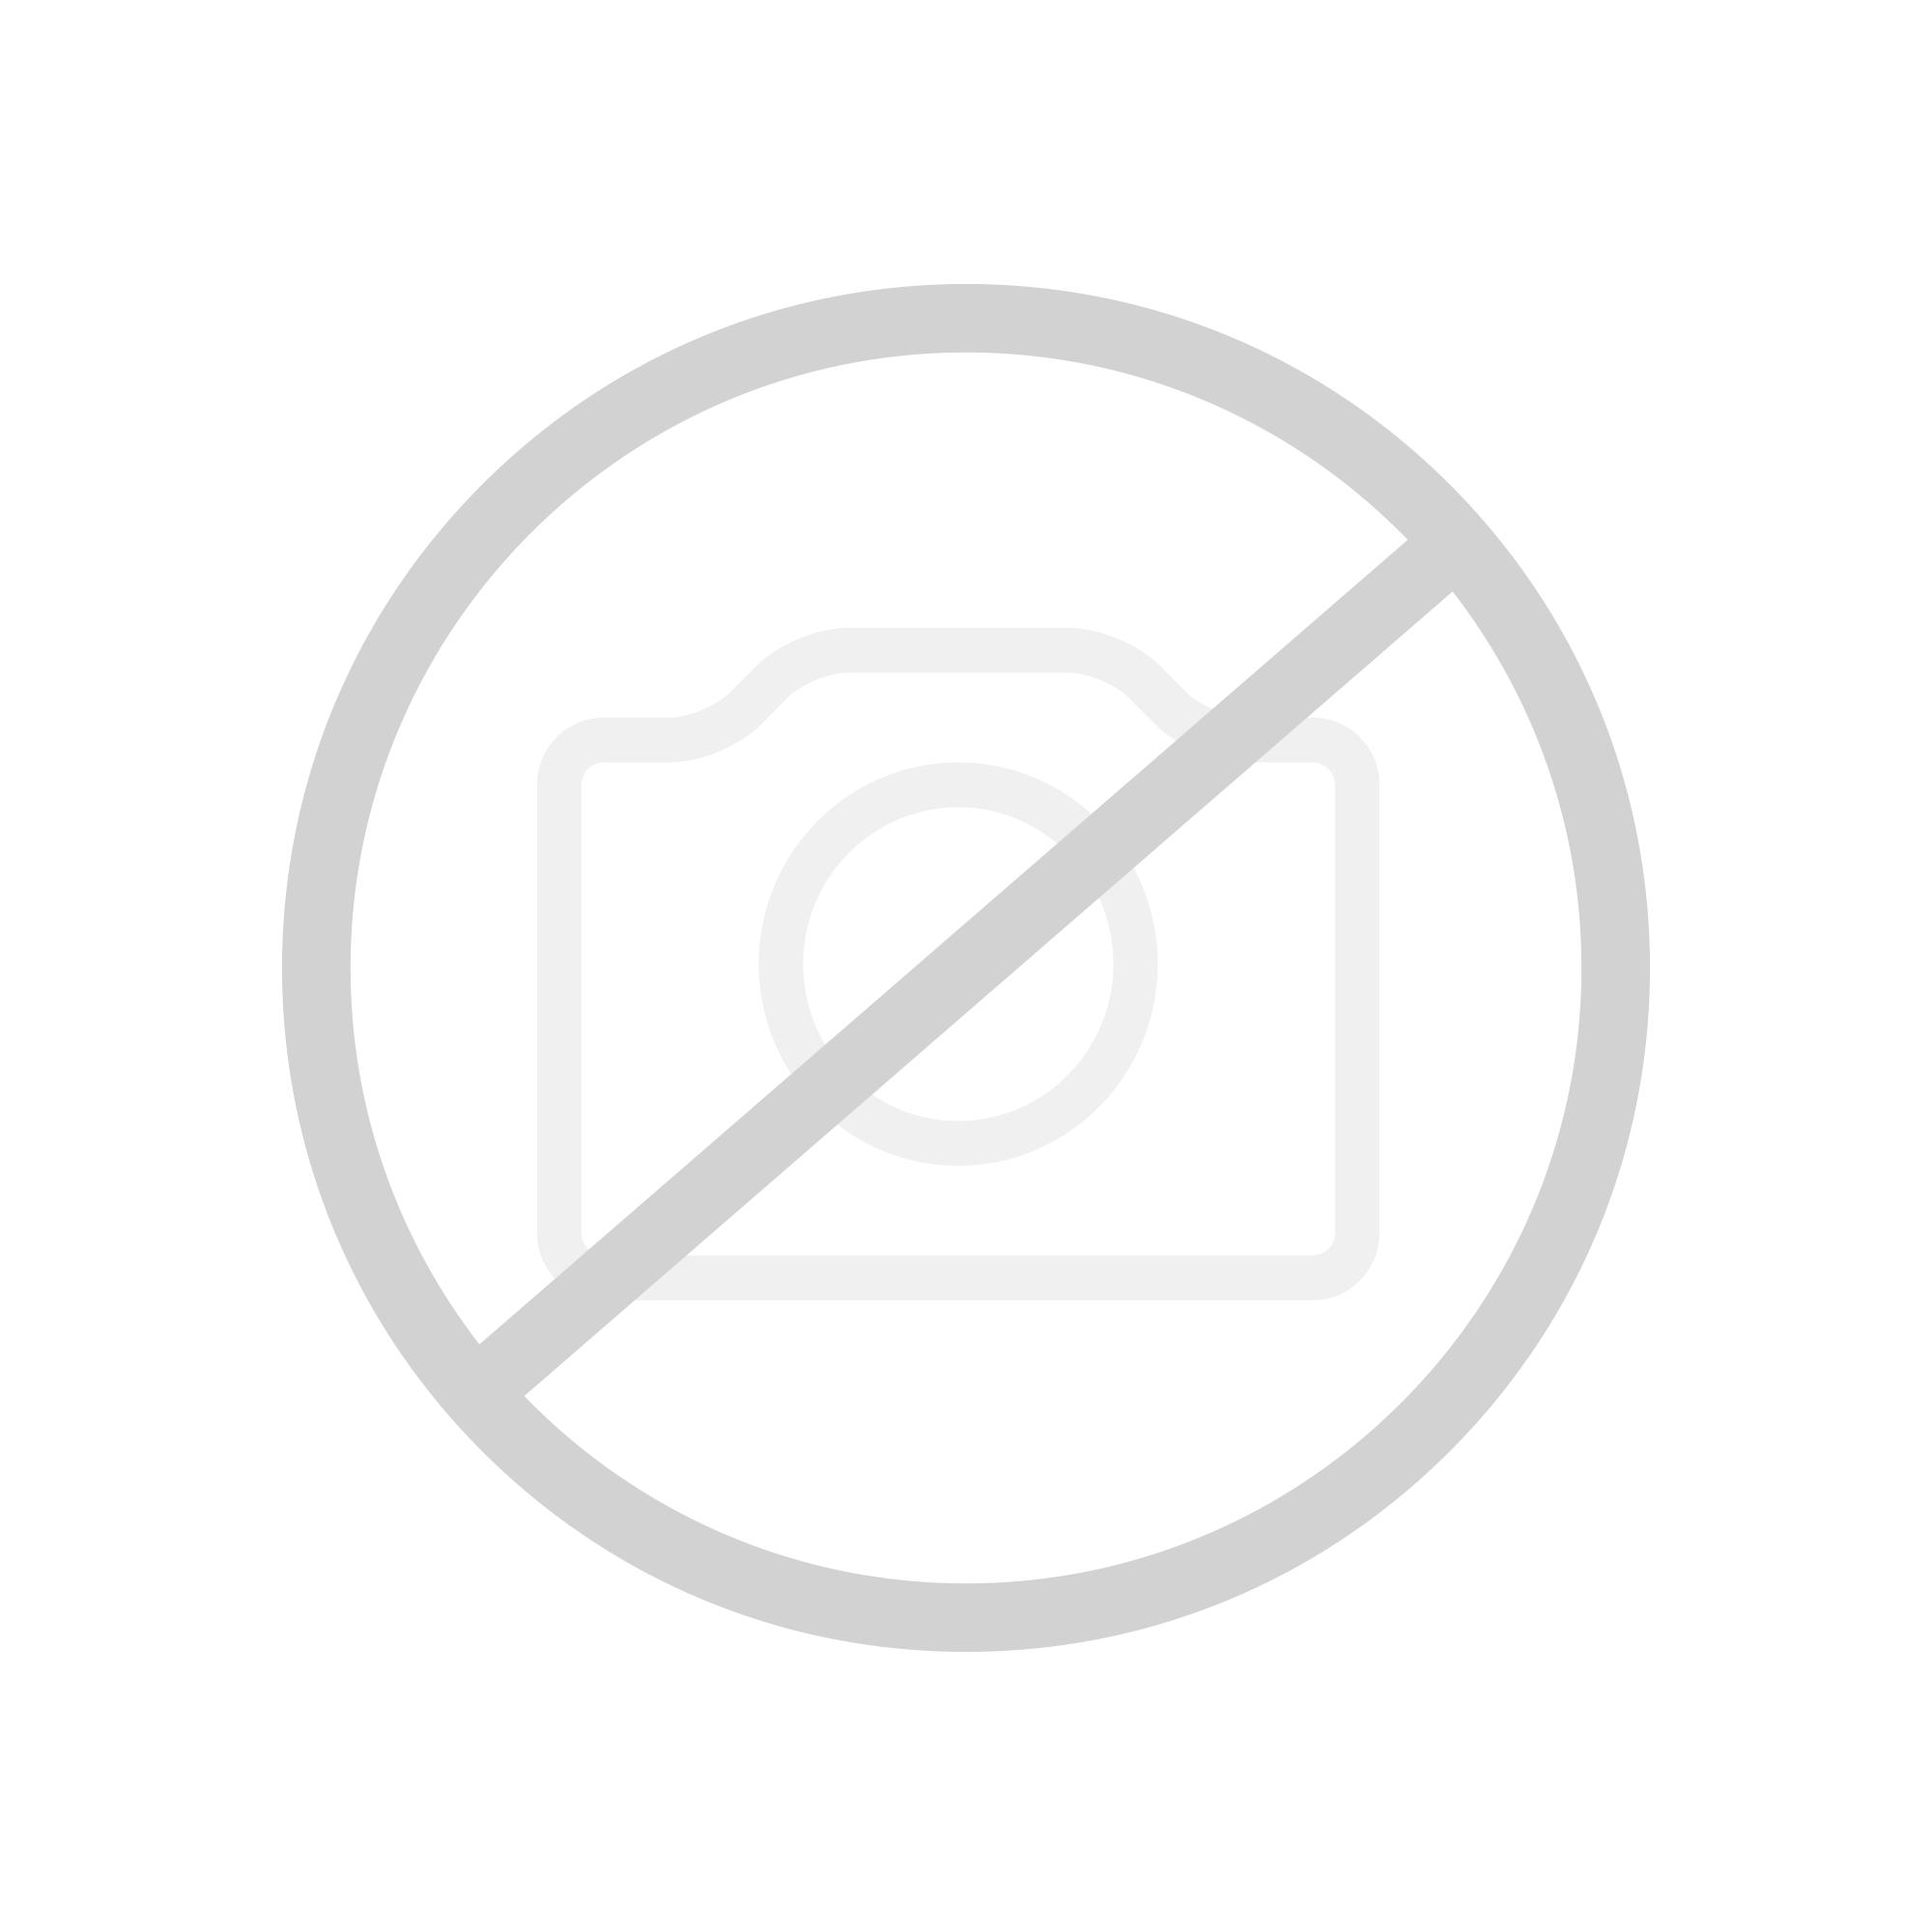 Geberit AquaClean 8000 Dusch-WC, UP, wandh., L: 61,5 B: 42 cm, WC-Sitz m. Deckel,Softclose